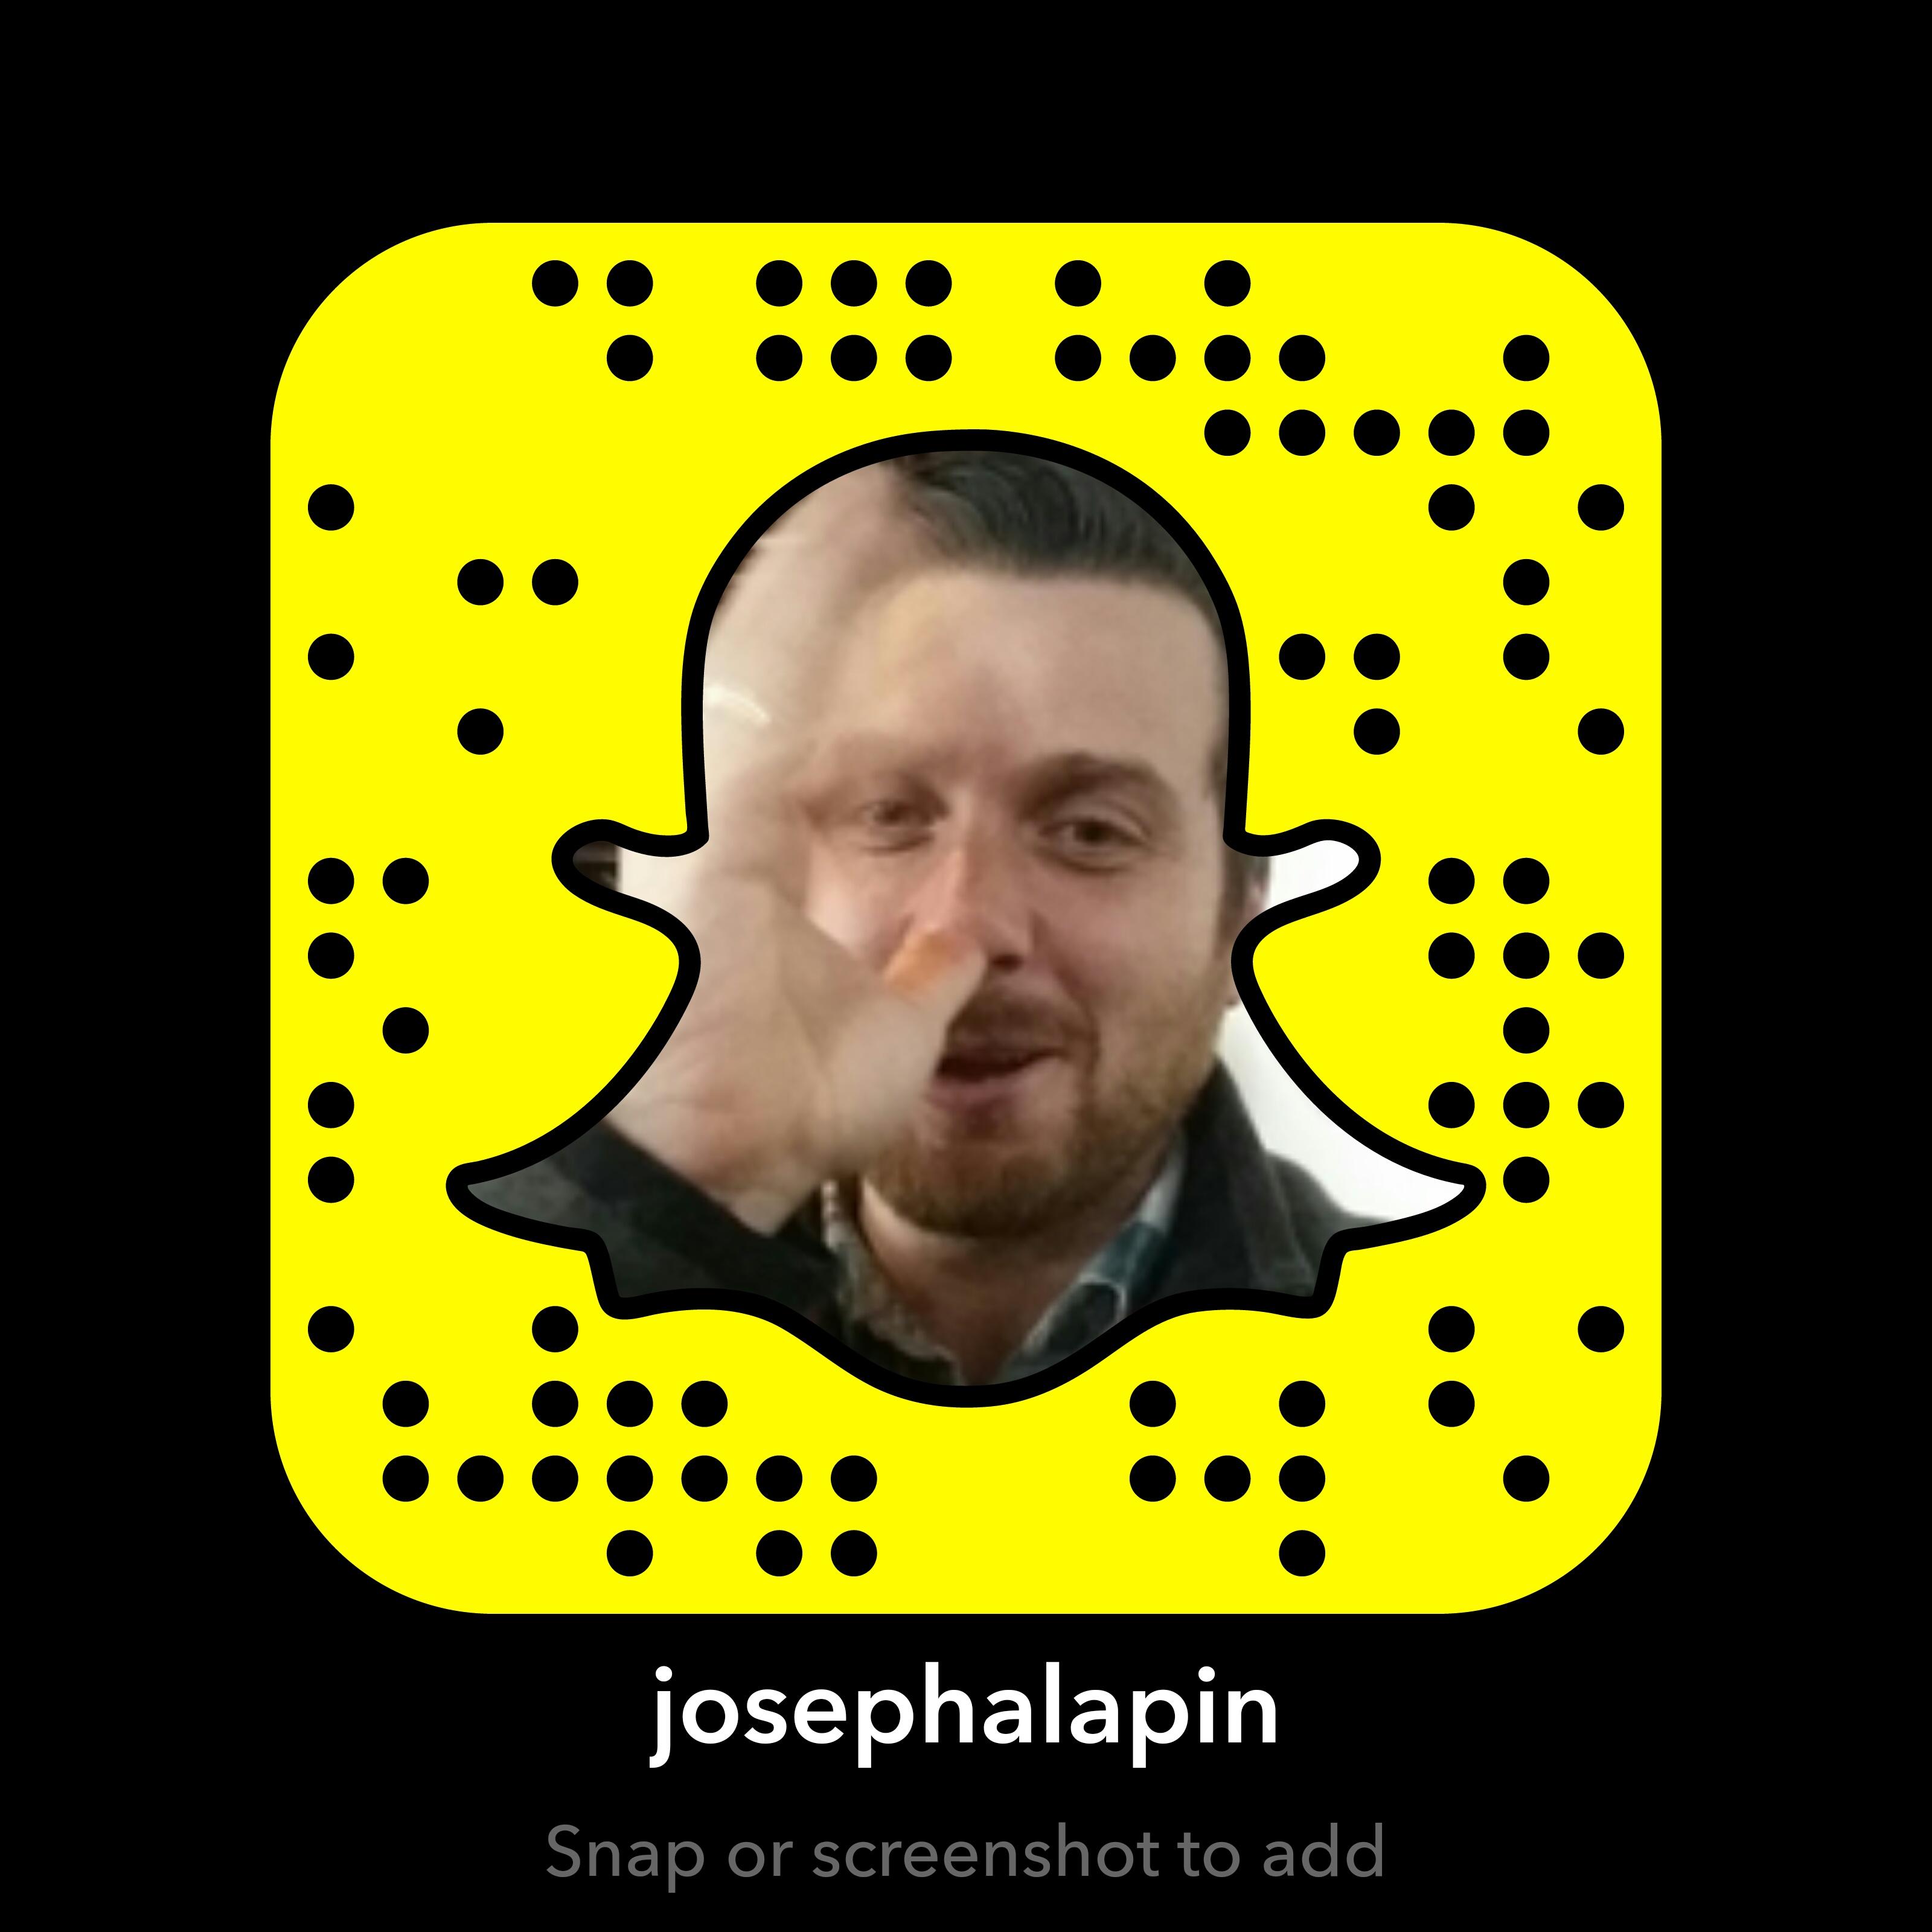 Joseph A Lapin on Snapchat